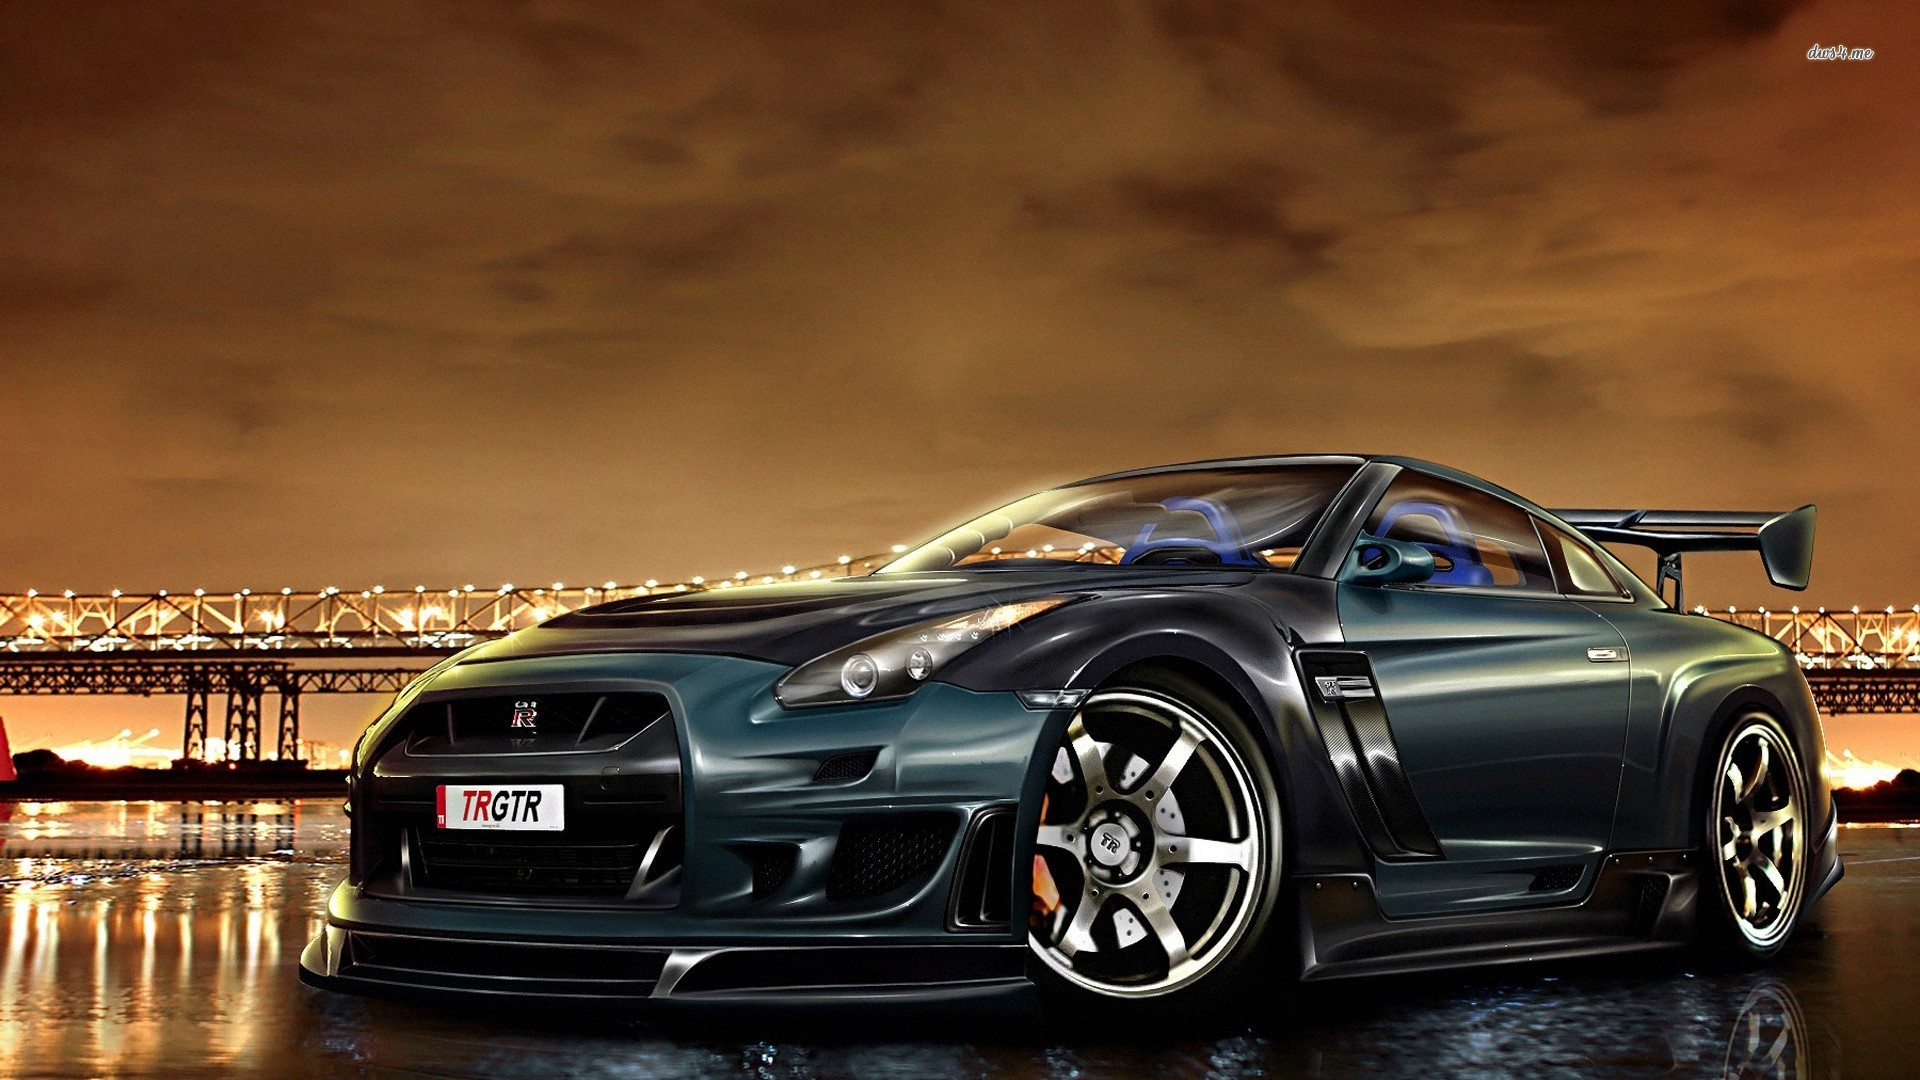 Nissan Skyline Wallpaper Hd 73 Images